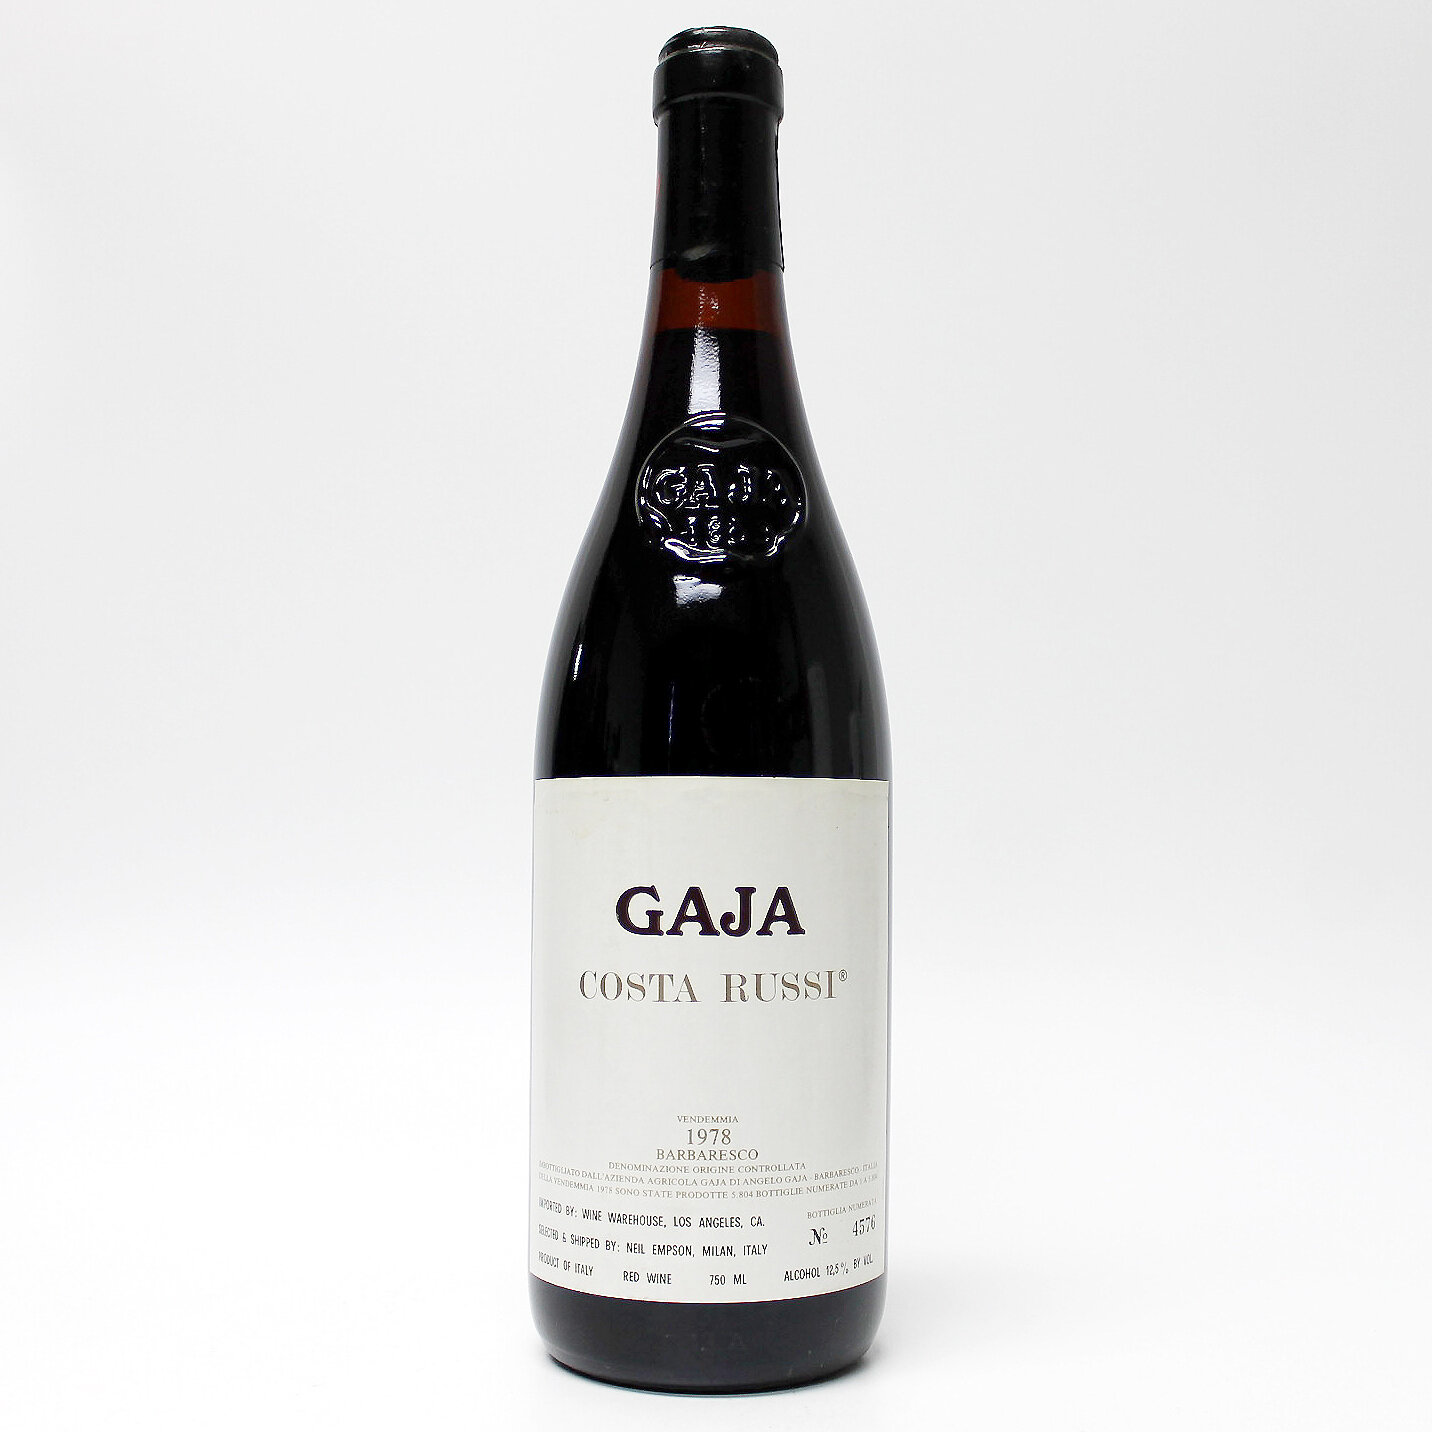 Gaja Costa Russi Langhe-Barbaresco Piedmont 2014 (750 ml)